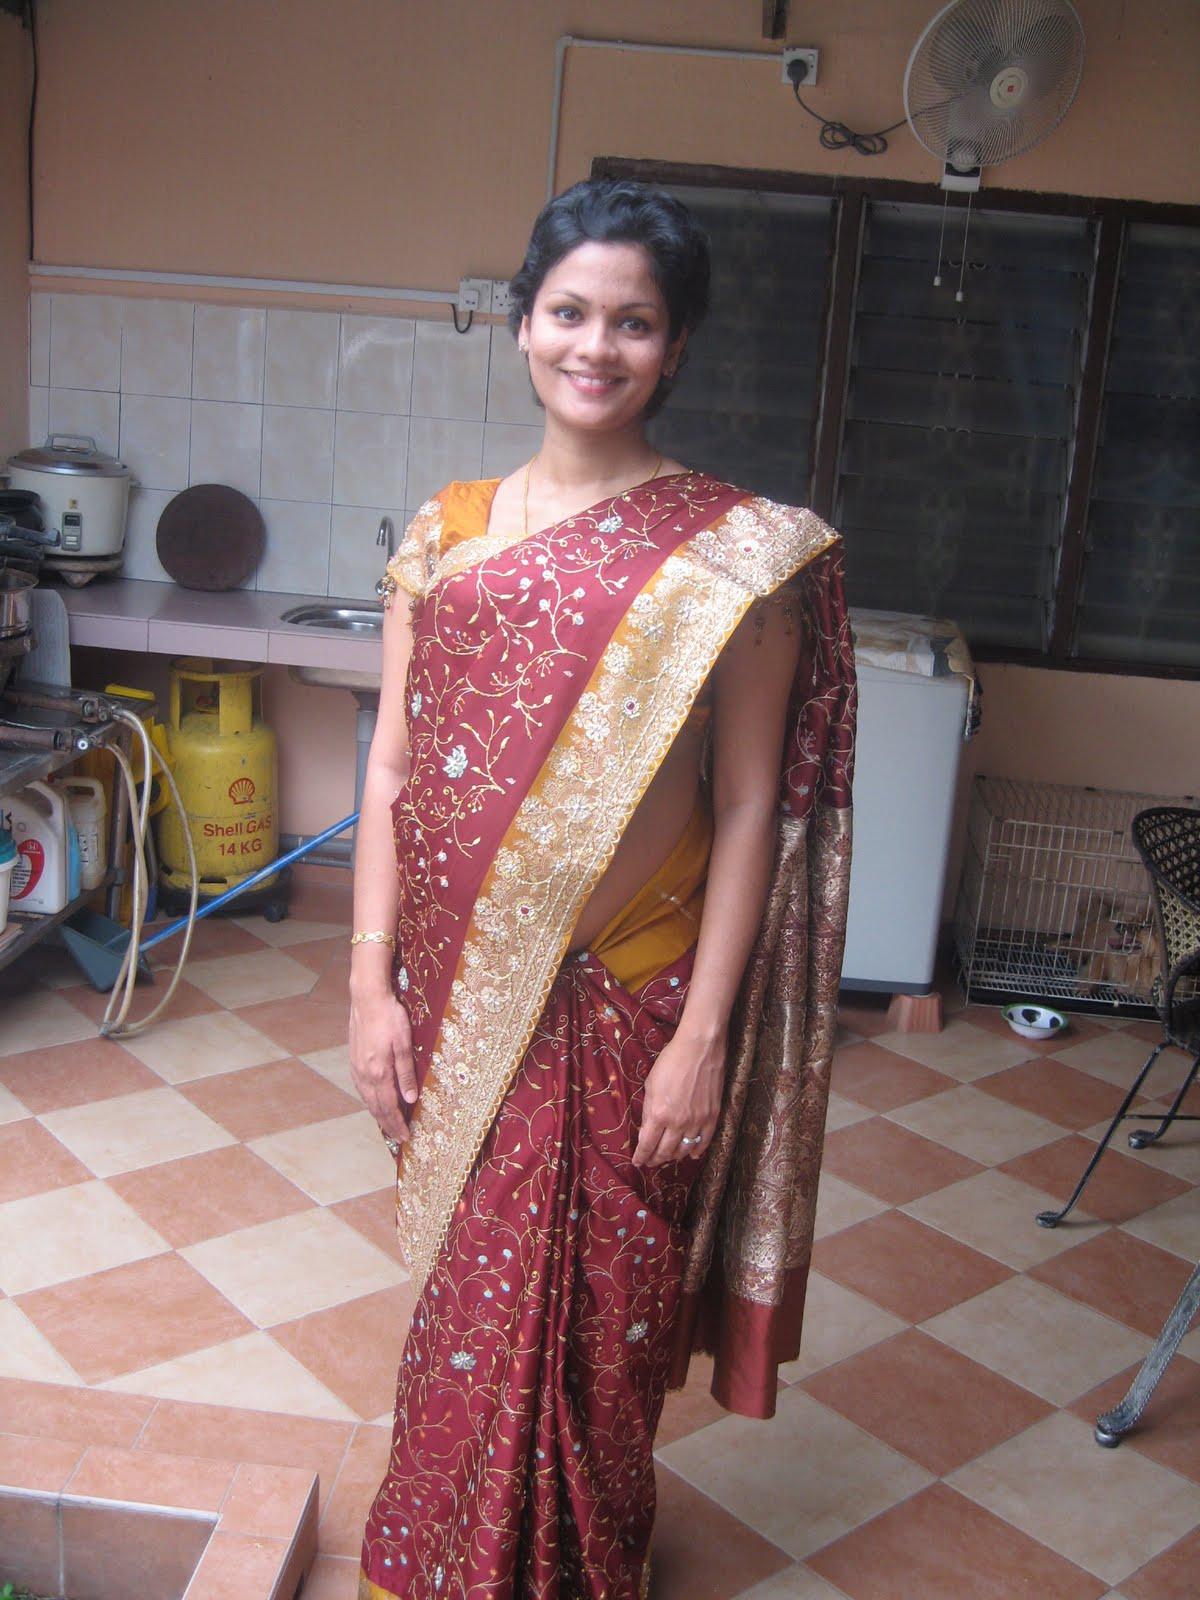 Valaikappu Indian Baby Shower 7Th August 2010  My Journal-5057